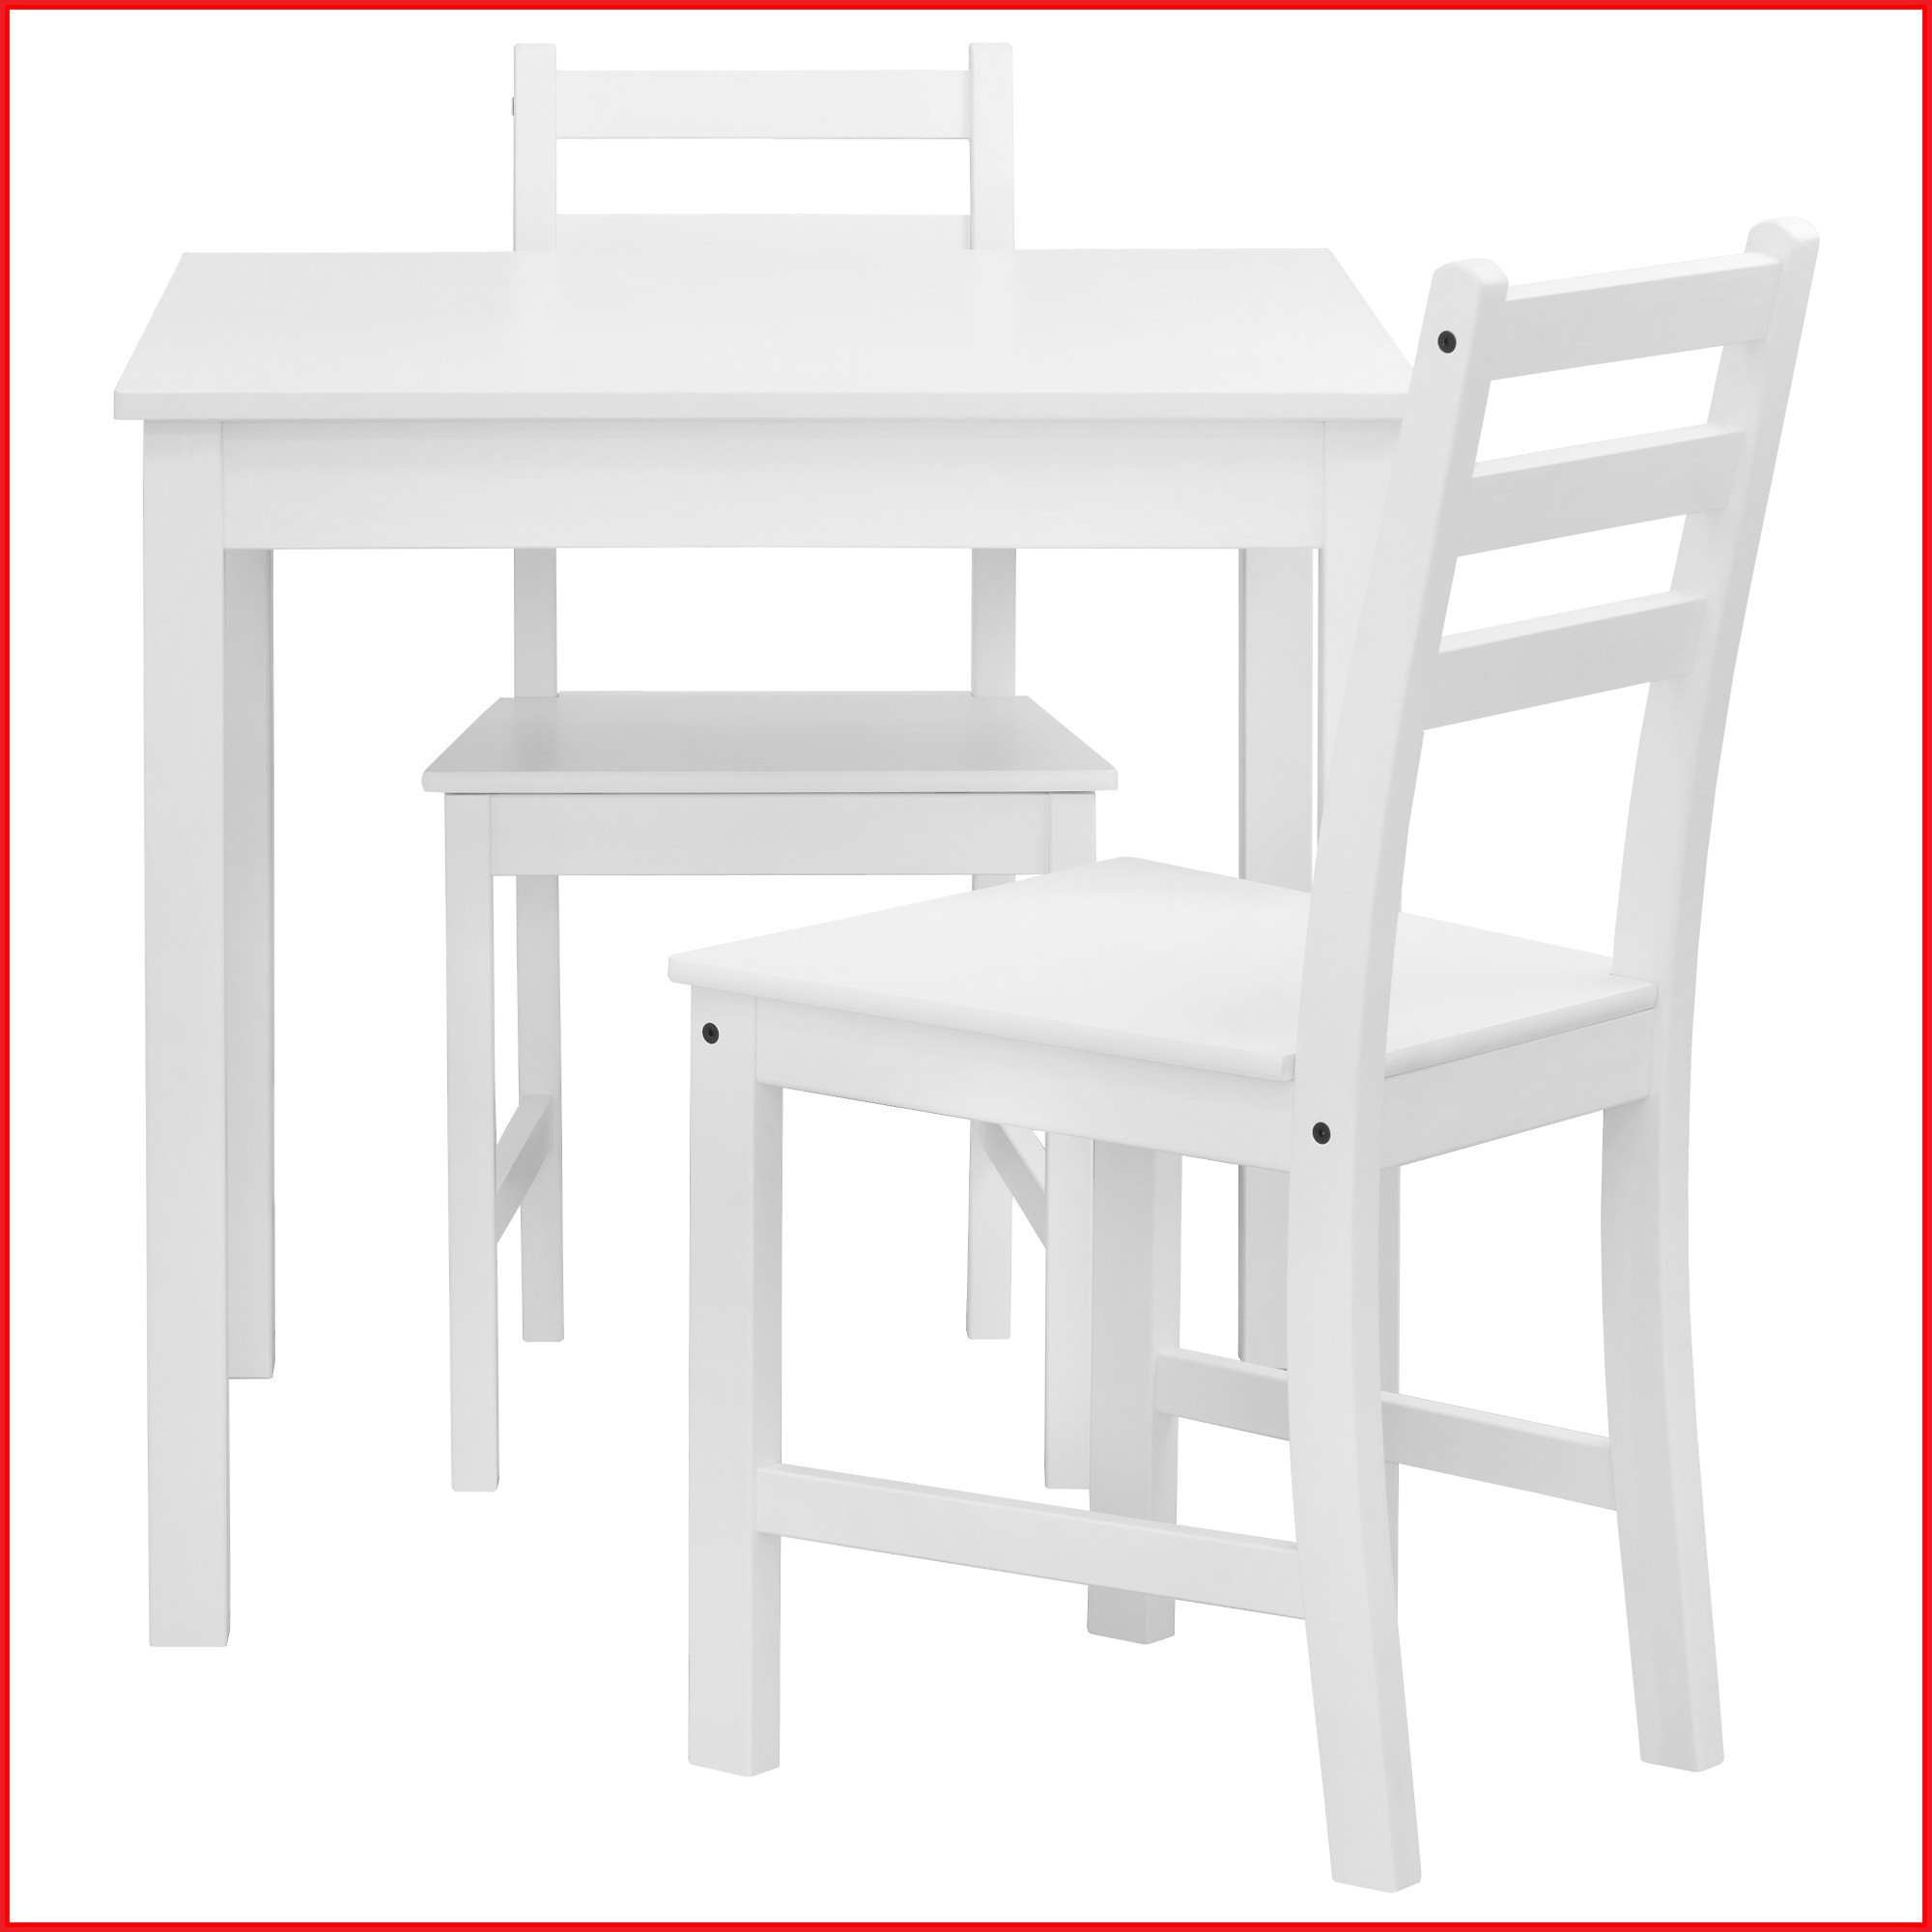 Ziokuwxtp Cocina De Ikea Mesas Sillas Hctdxsqr Y c354ARjqSL